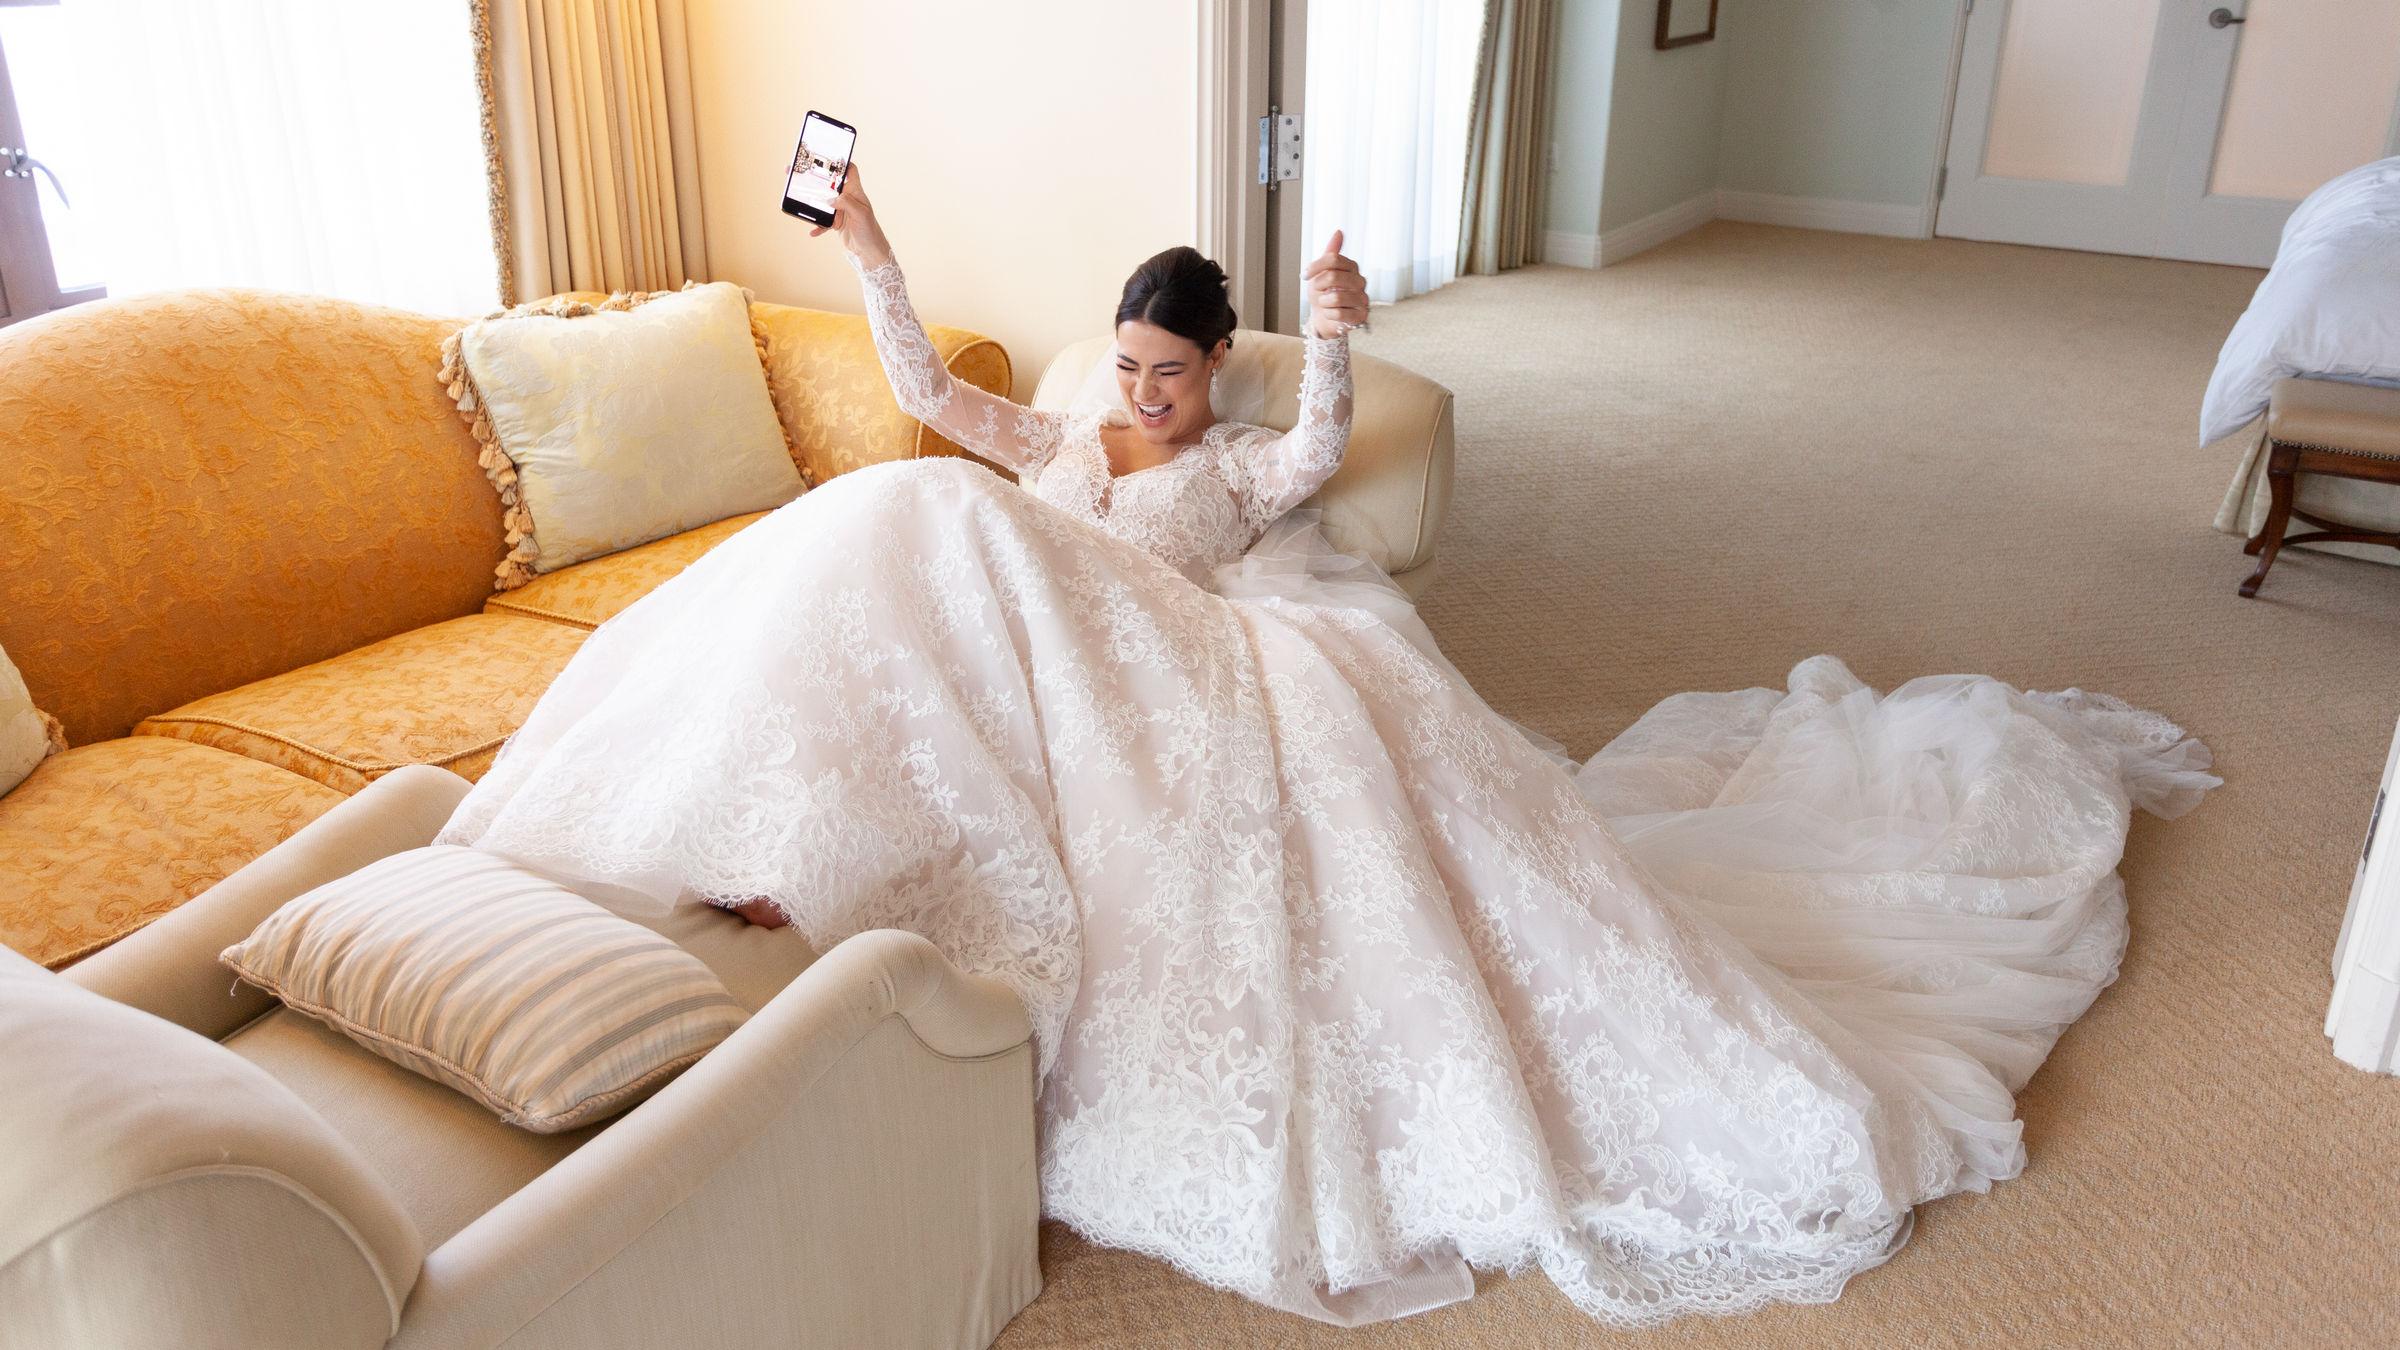 maria-eduardo-montage-beverly-hills-wedding-148.jpg